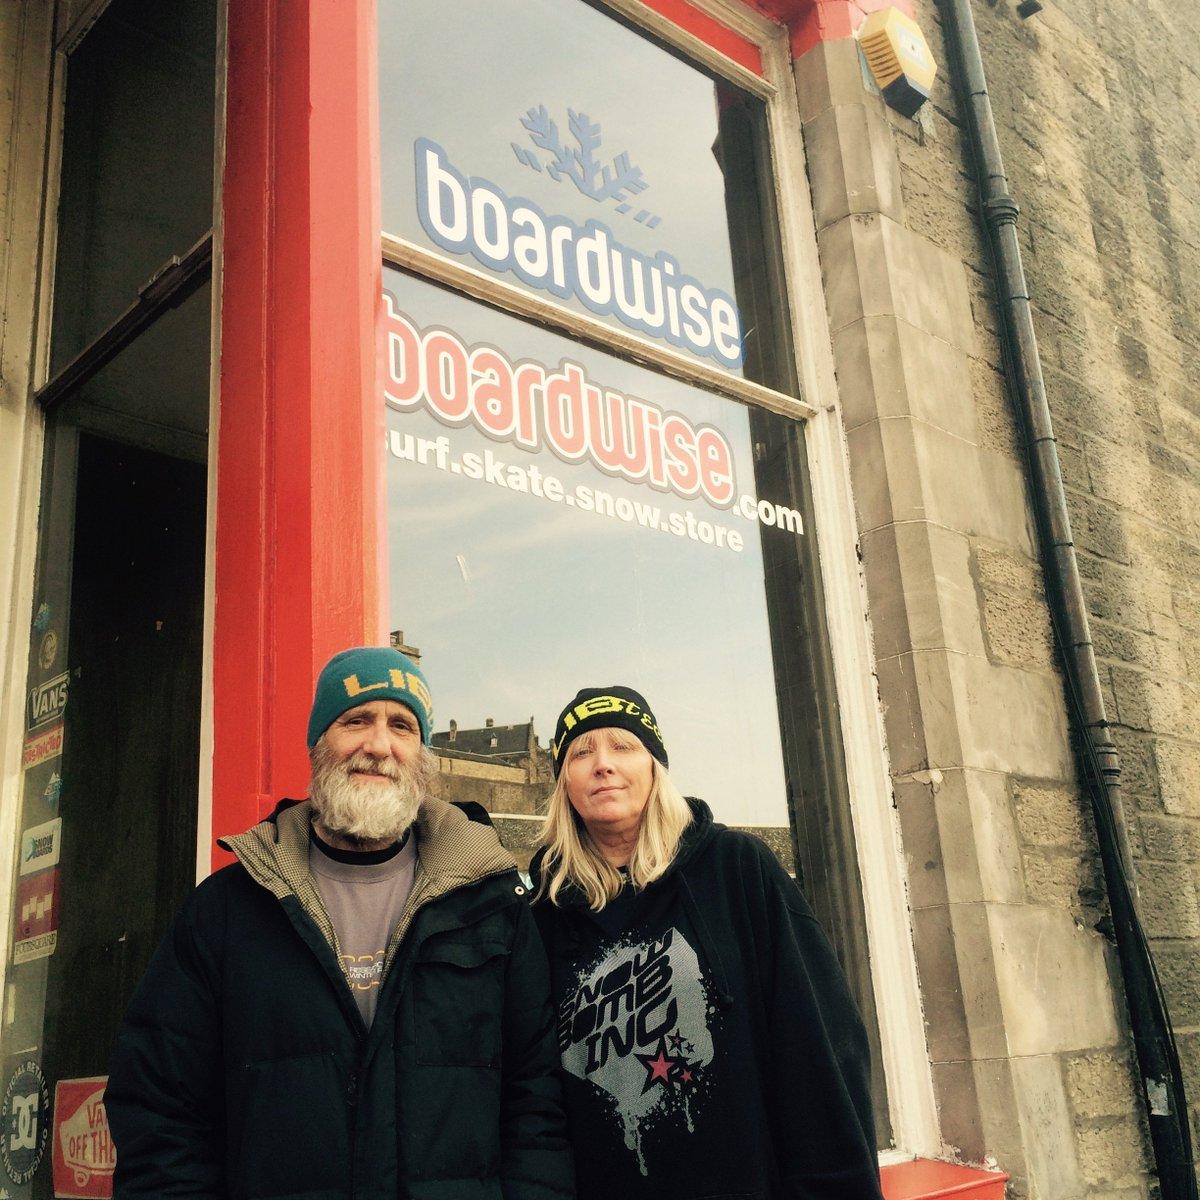 Edinburgh's @BoardwiseUK surf & snowboard shop set to bounce back after last summer's destructive fire scotsman.com/lifestyle/outd…